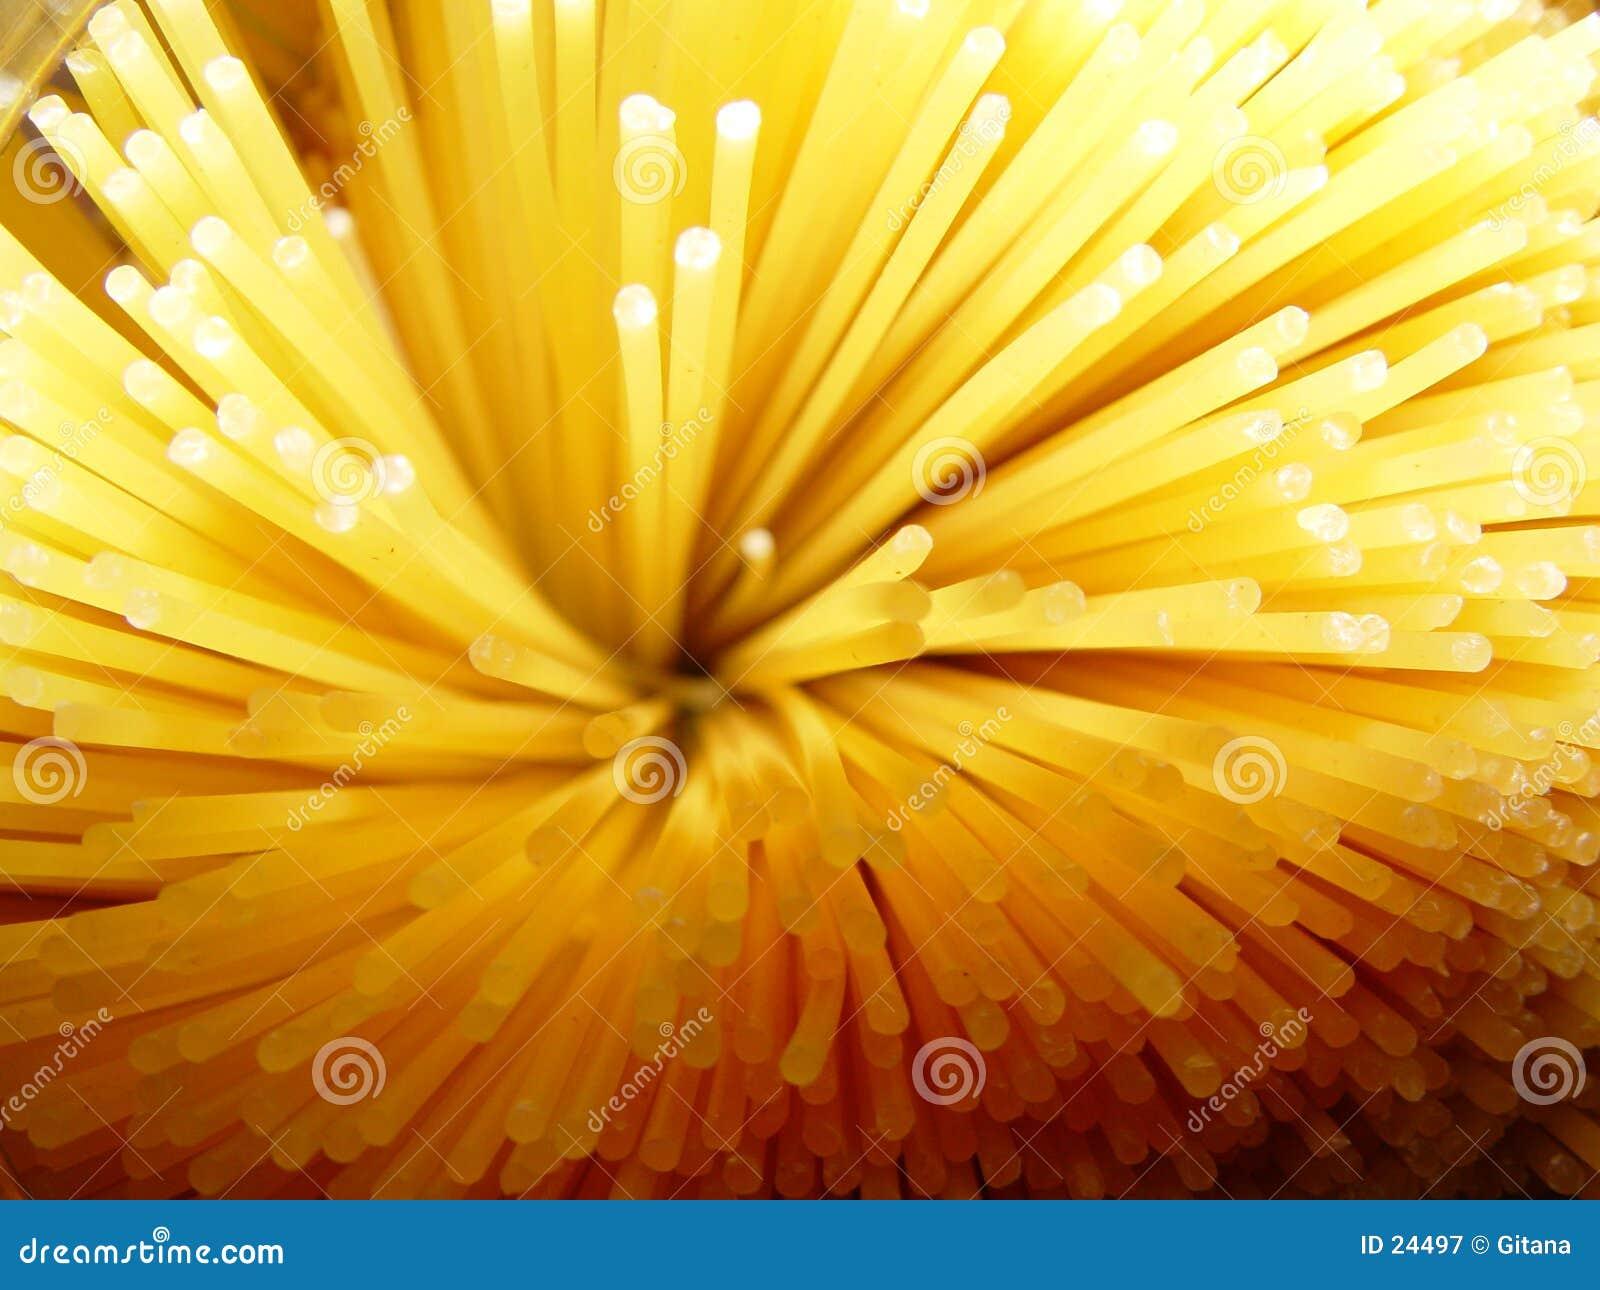 Spaghetti Details